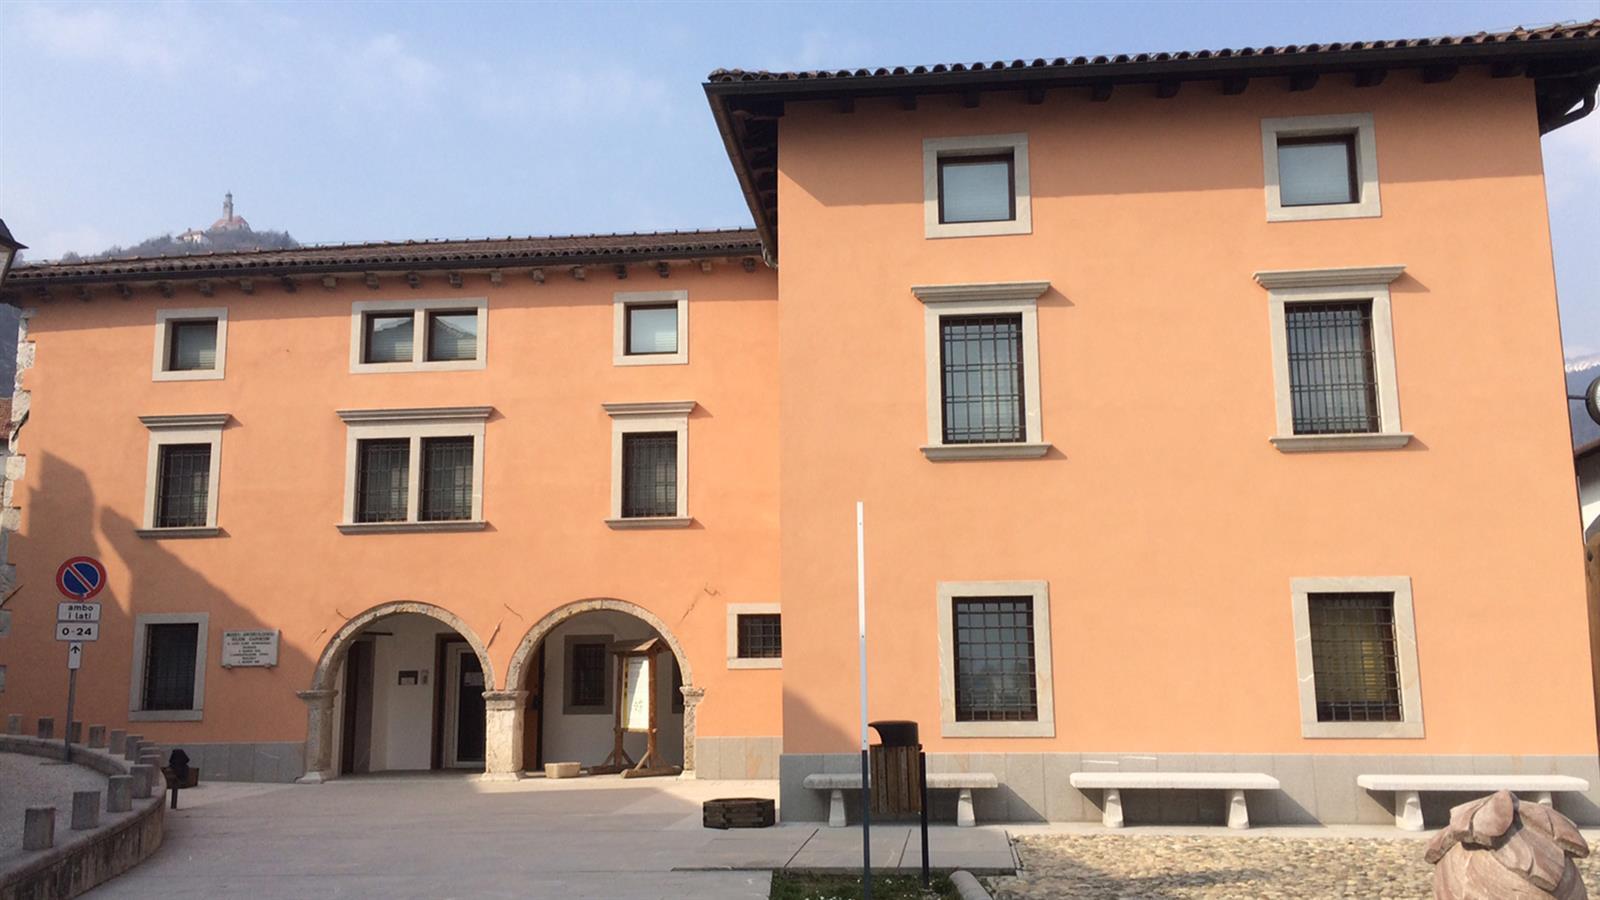 Visita guidata: Civico Museo Archeologico